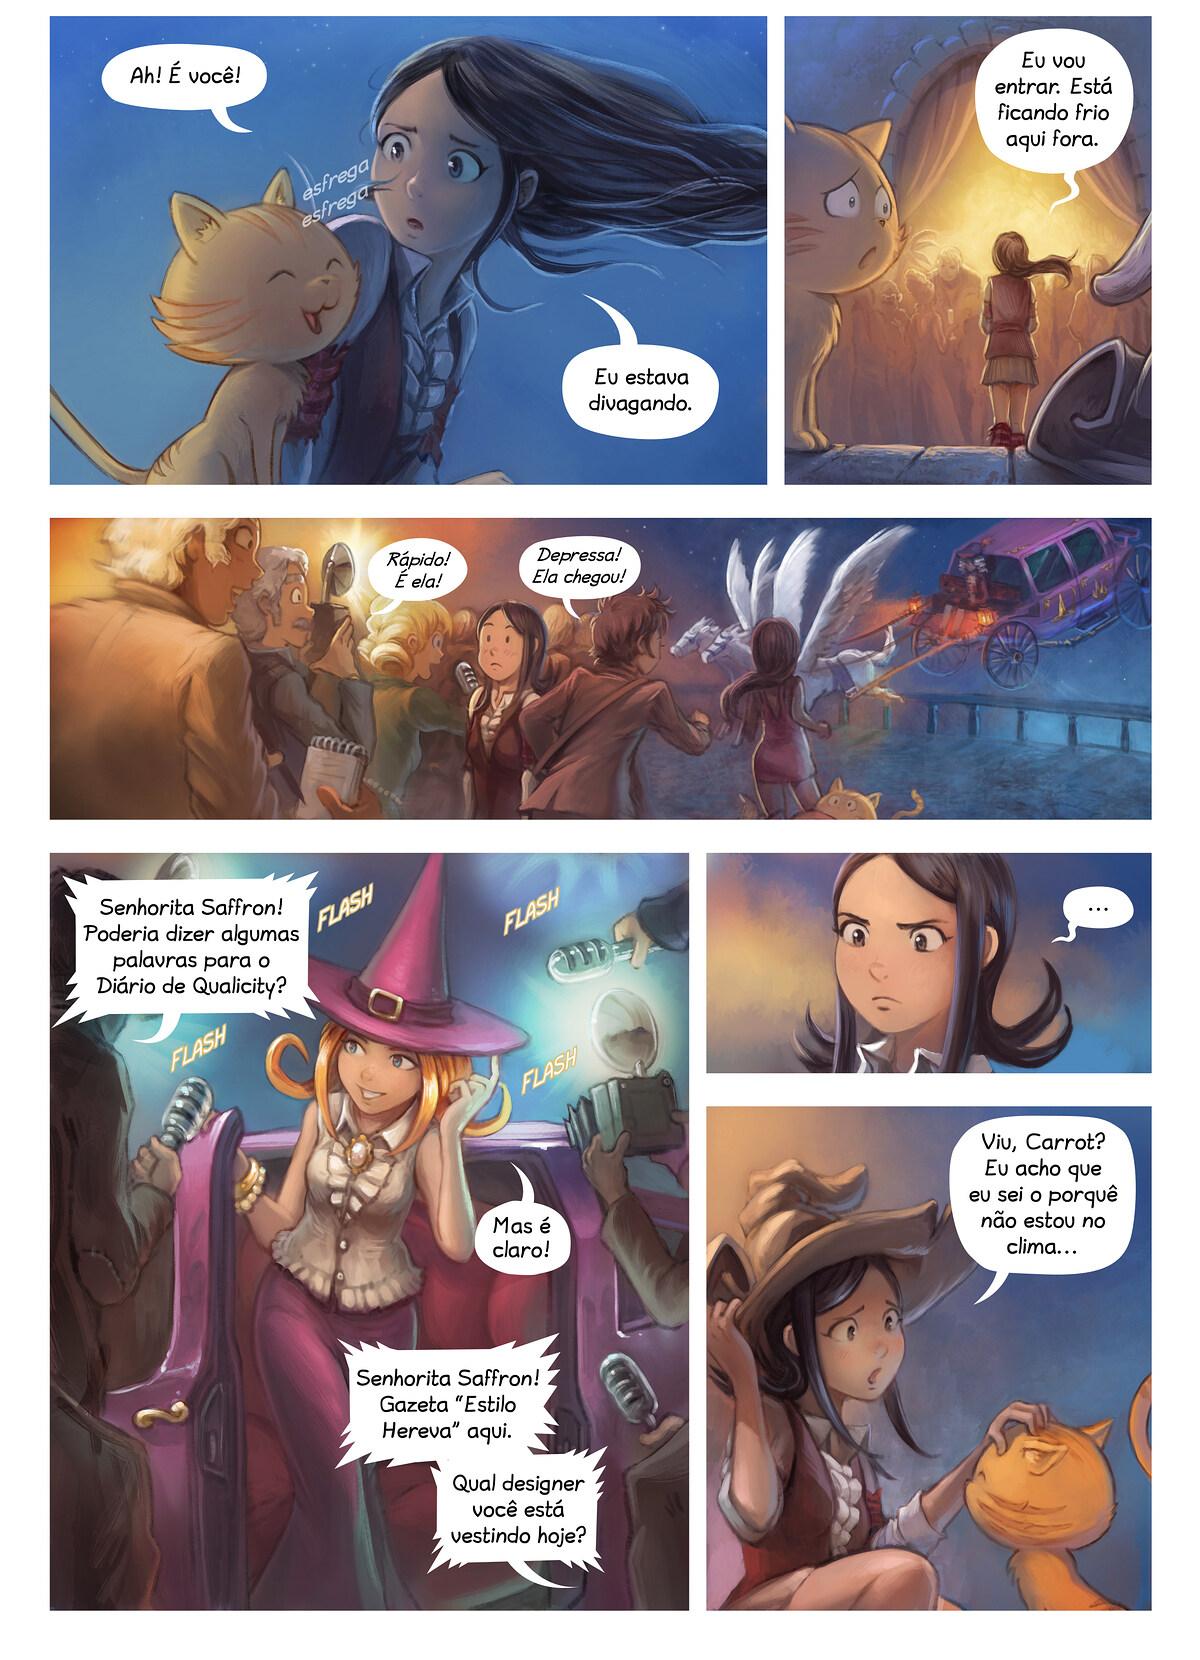 A webcomic page of Pepper&Carrot, episódio 28 [pt], página 4